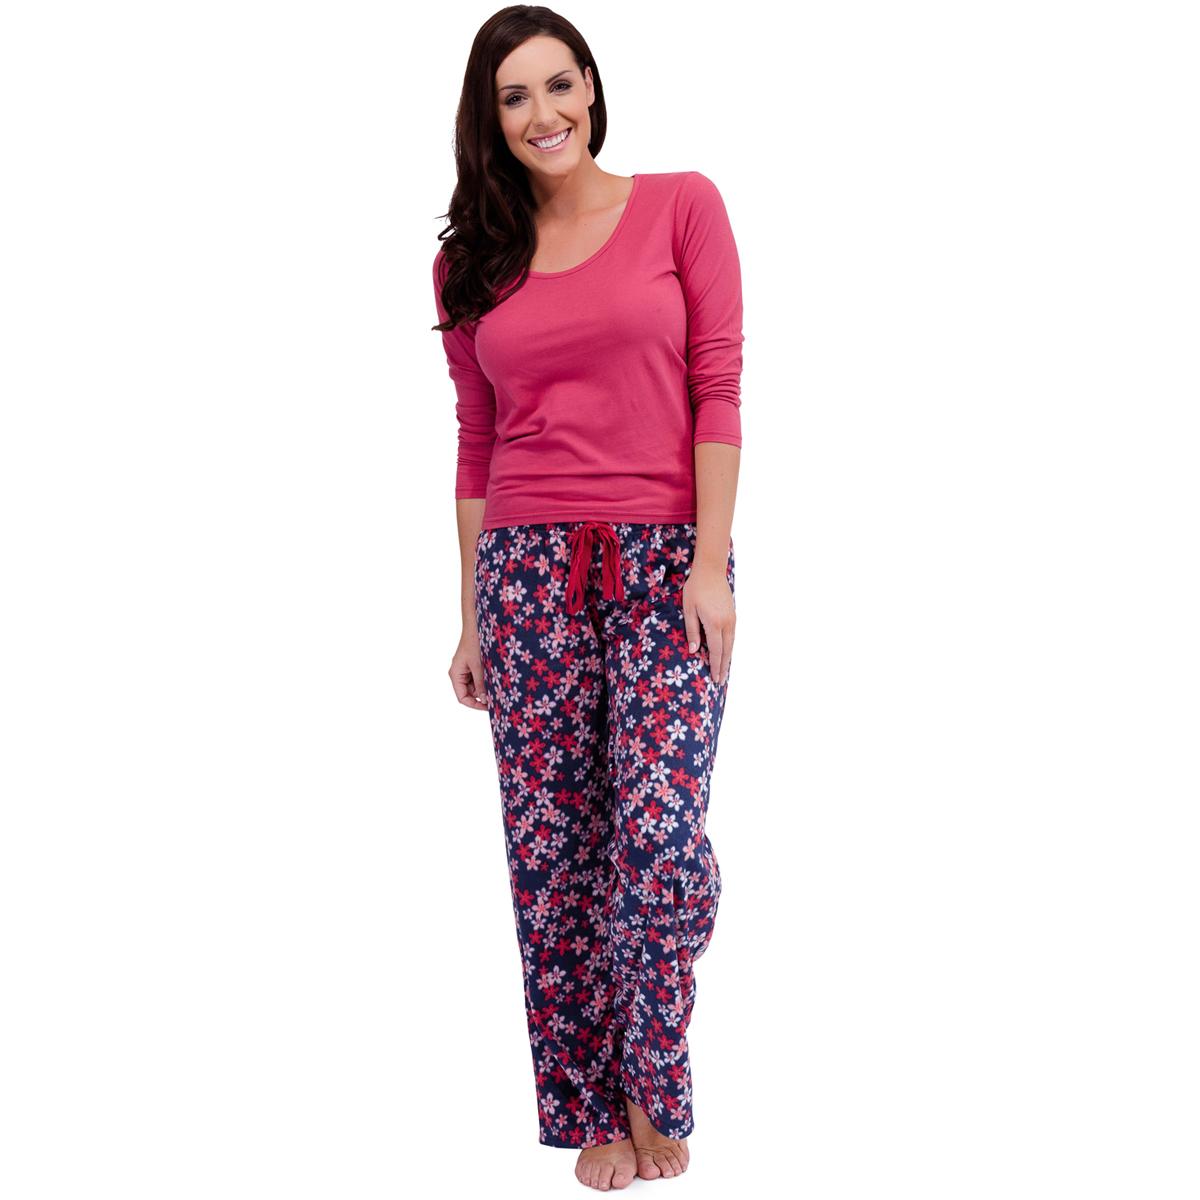 womens warm fleece winter pj pyjama set night wear pj 39 s. Black Bedroom Furniture Sets. Home Design Ideas